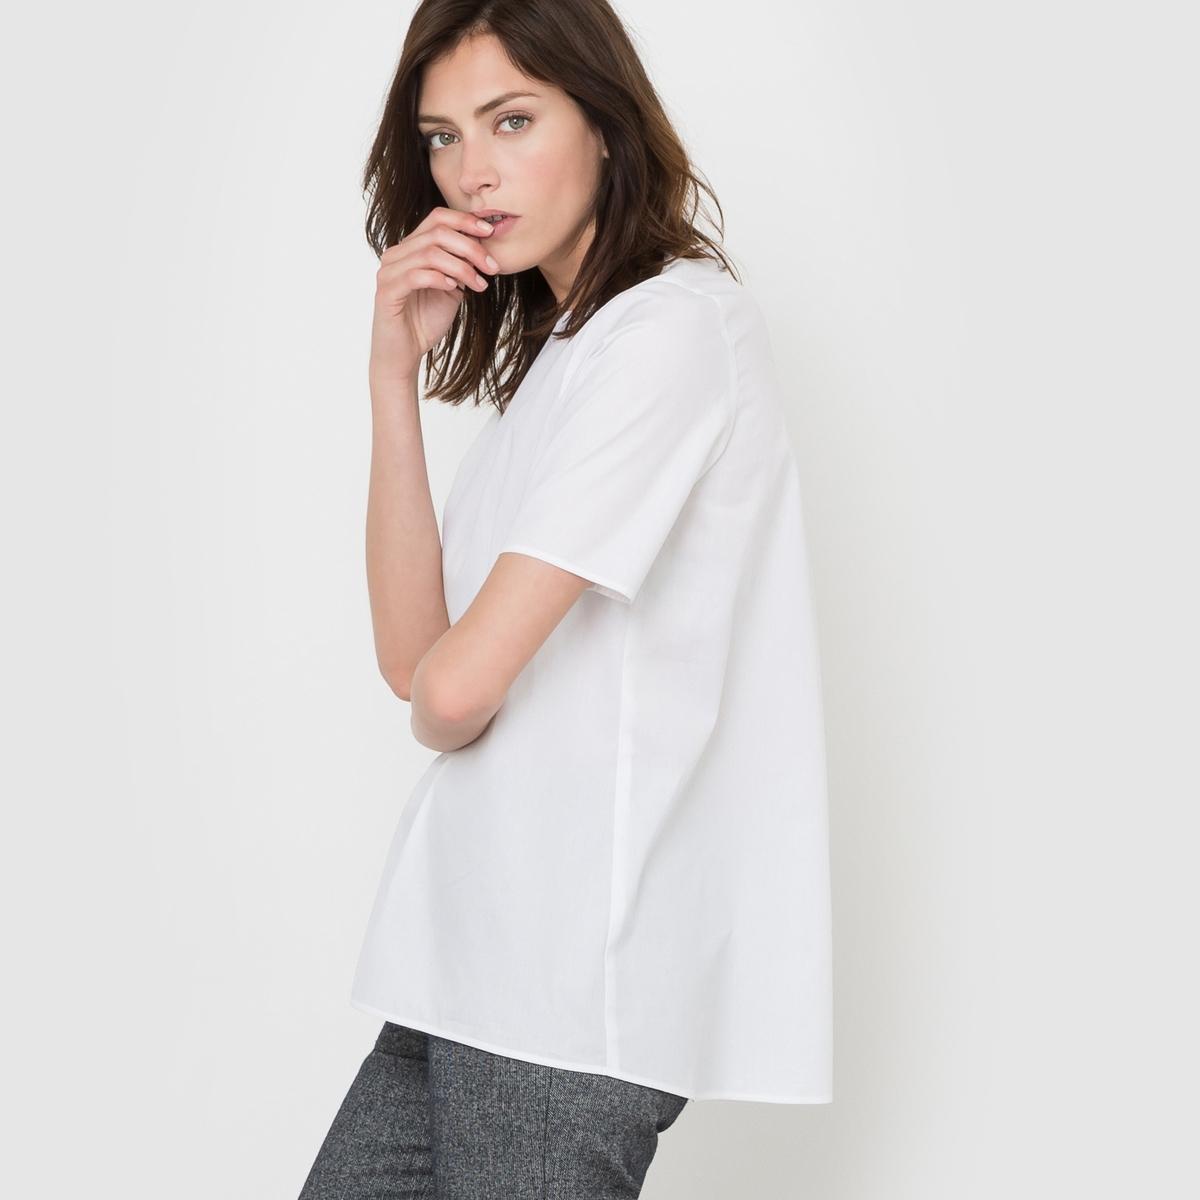 Блузка из хлопка с короткими рукавами